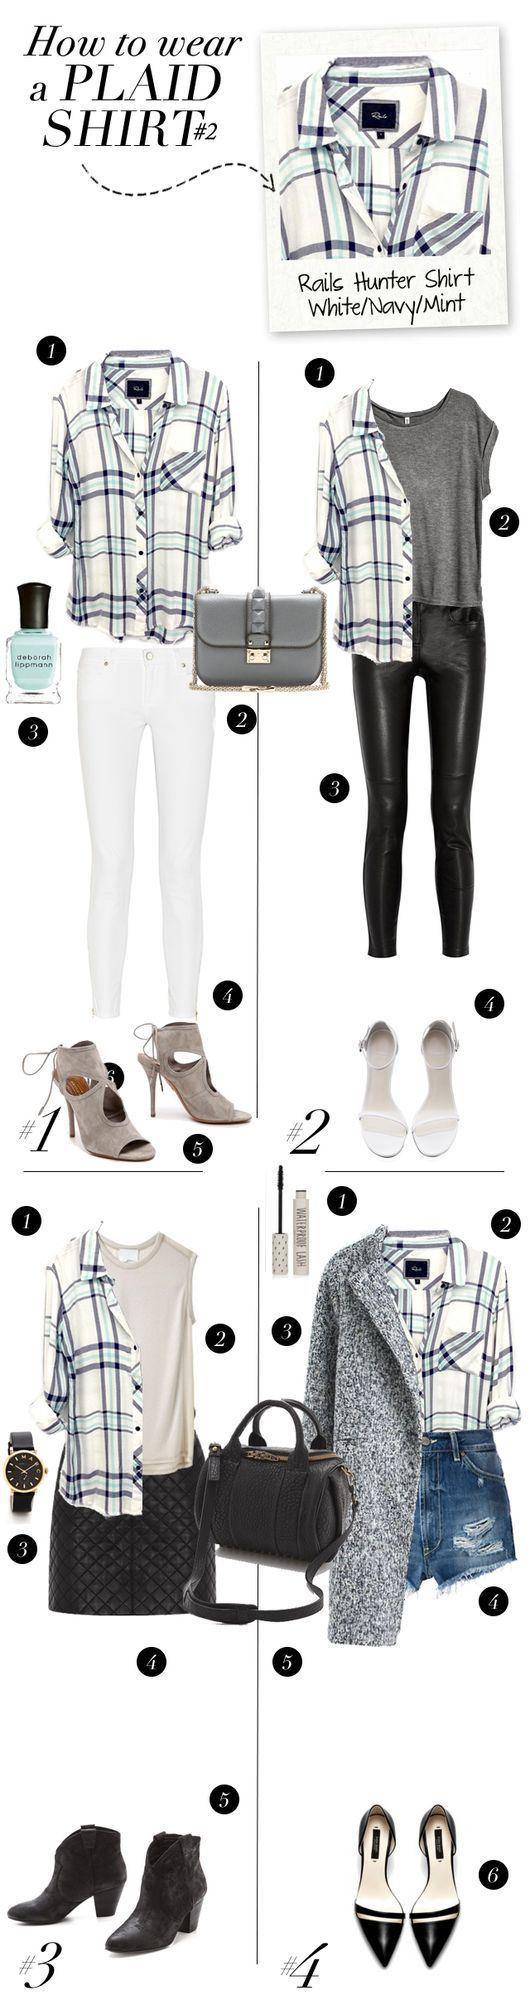 FASHION: How To Wear a plaid shirt (via Bloglovin.com )